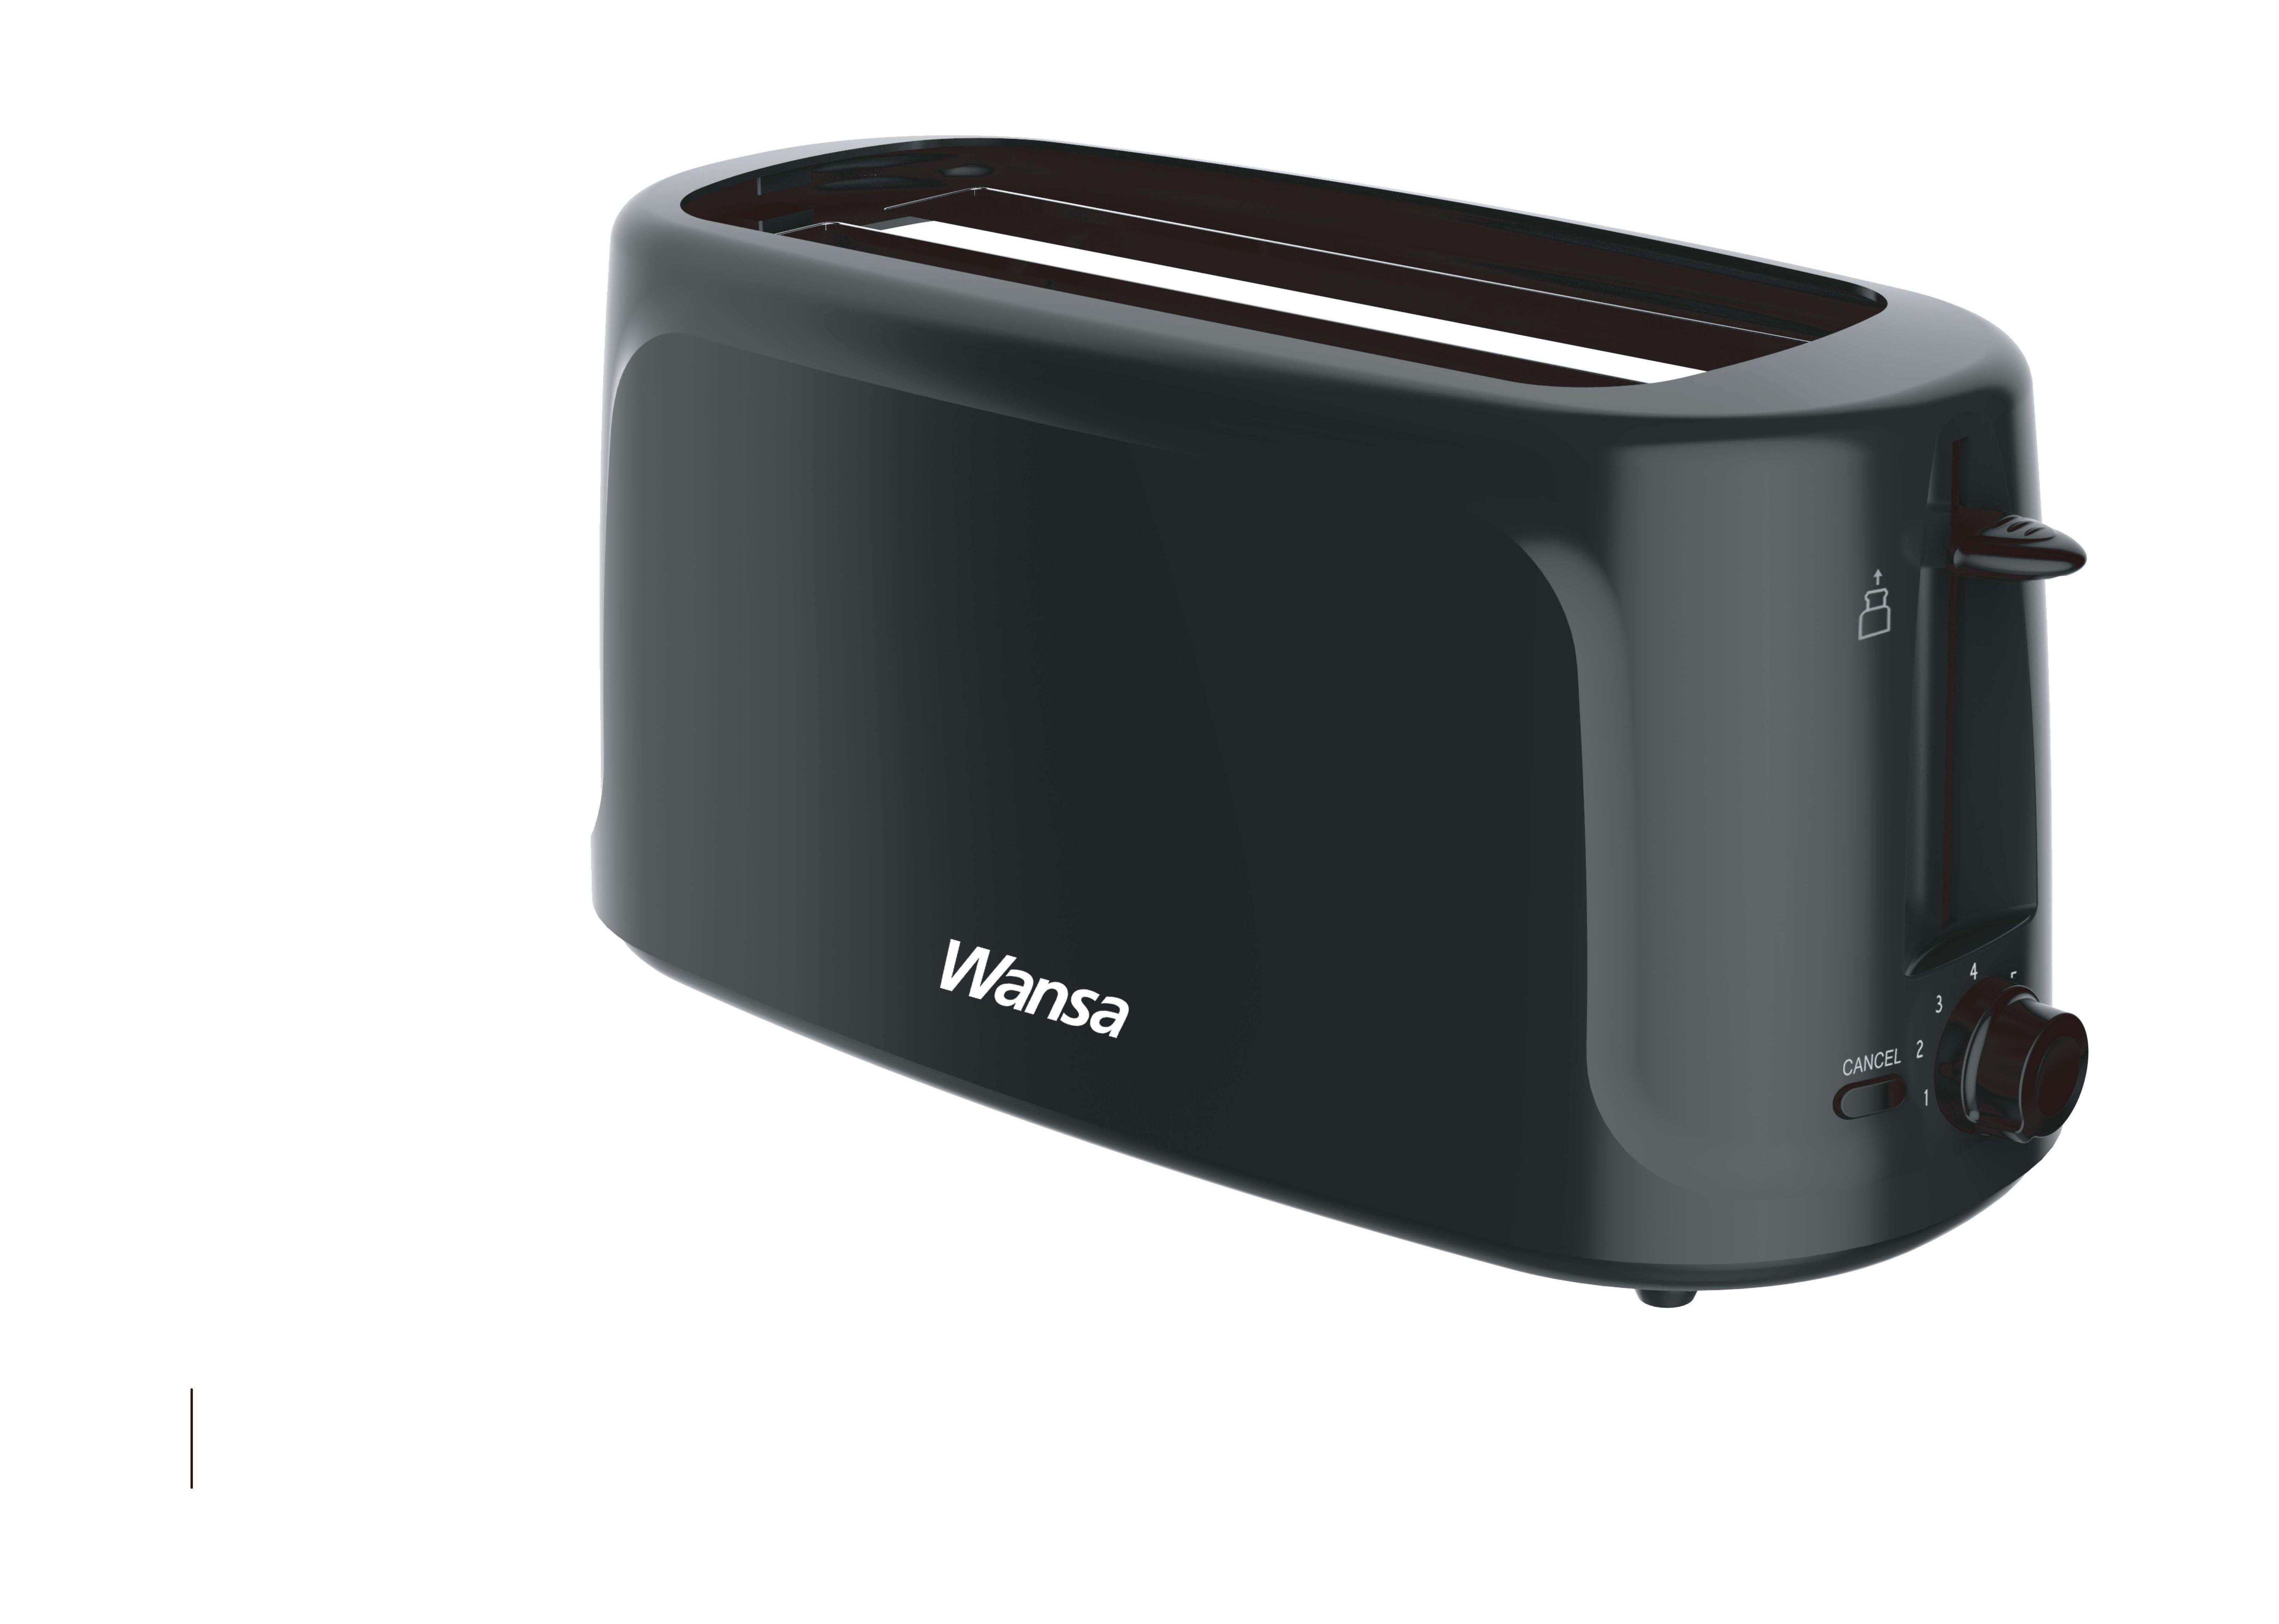 oven decker stainless walmart toaster slice com ip black steel